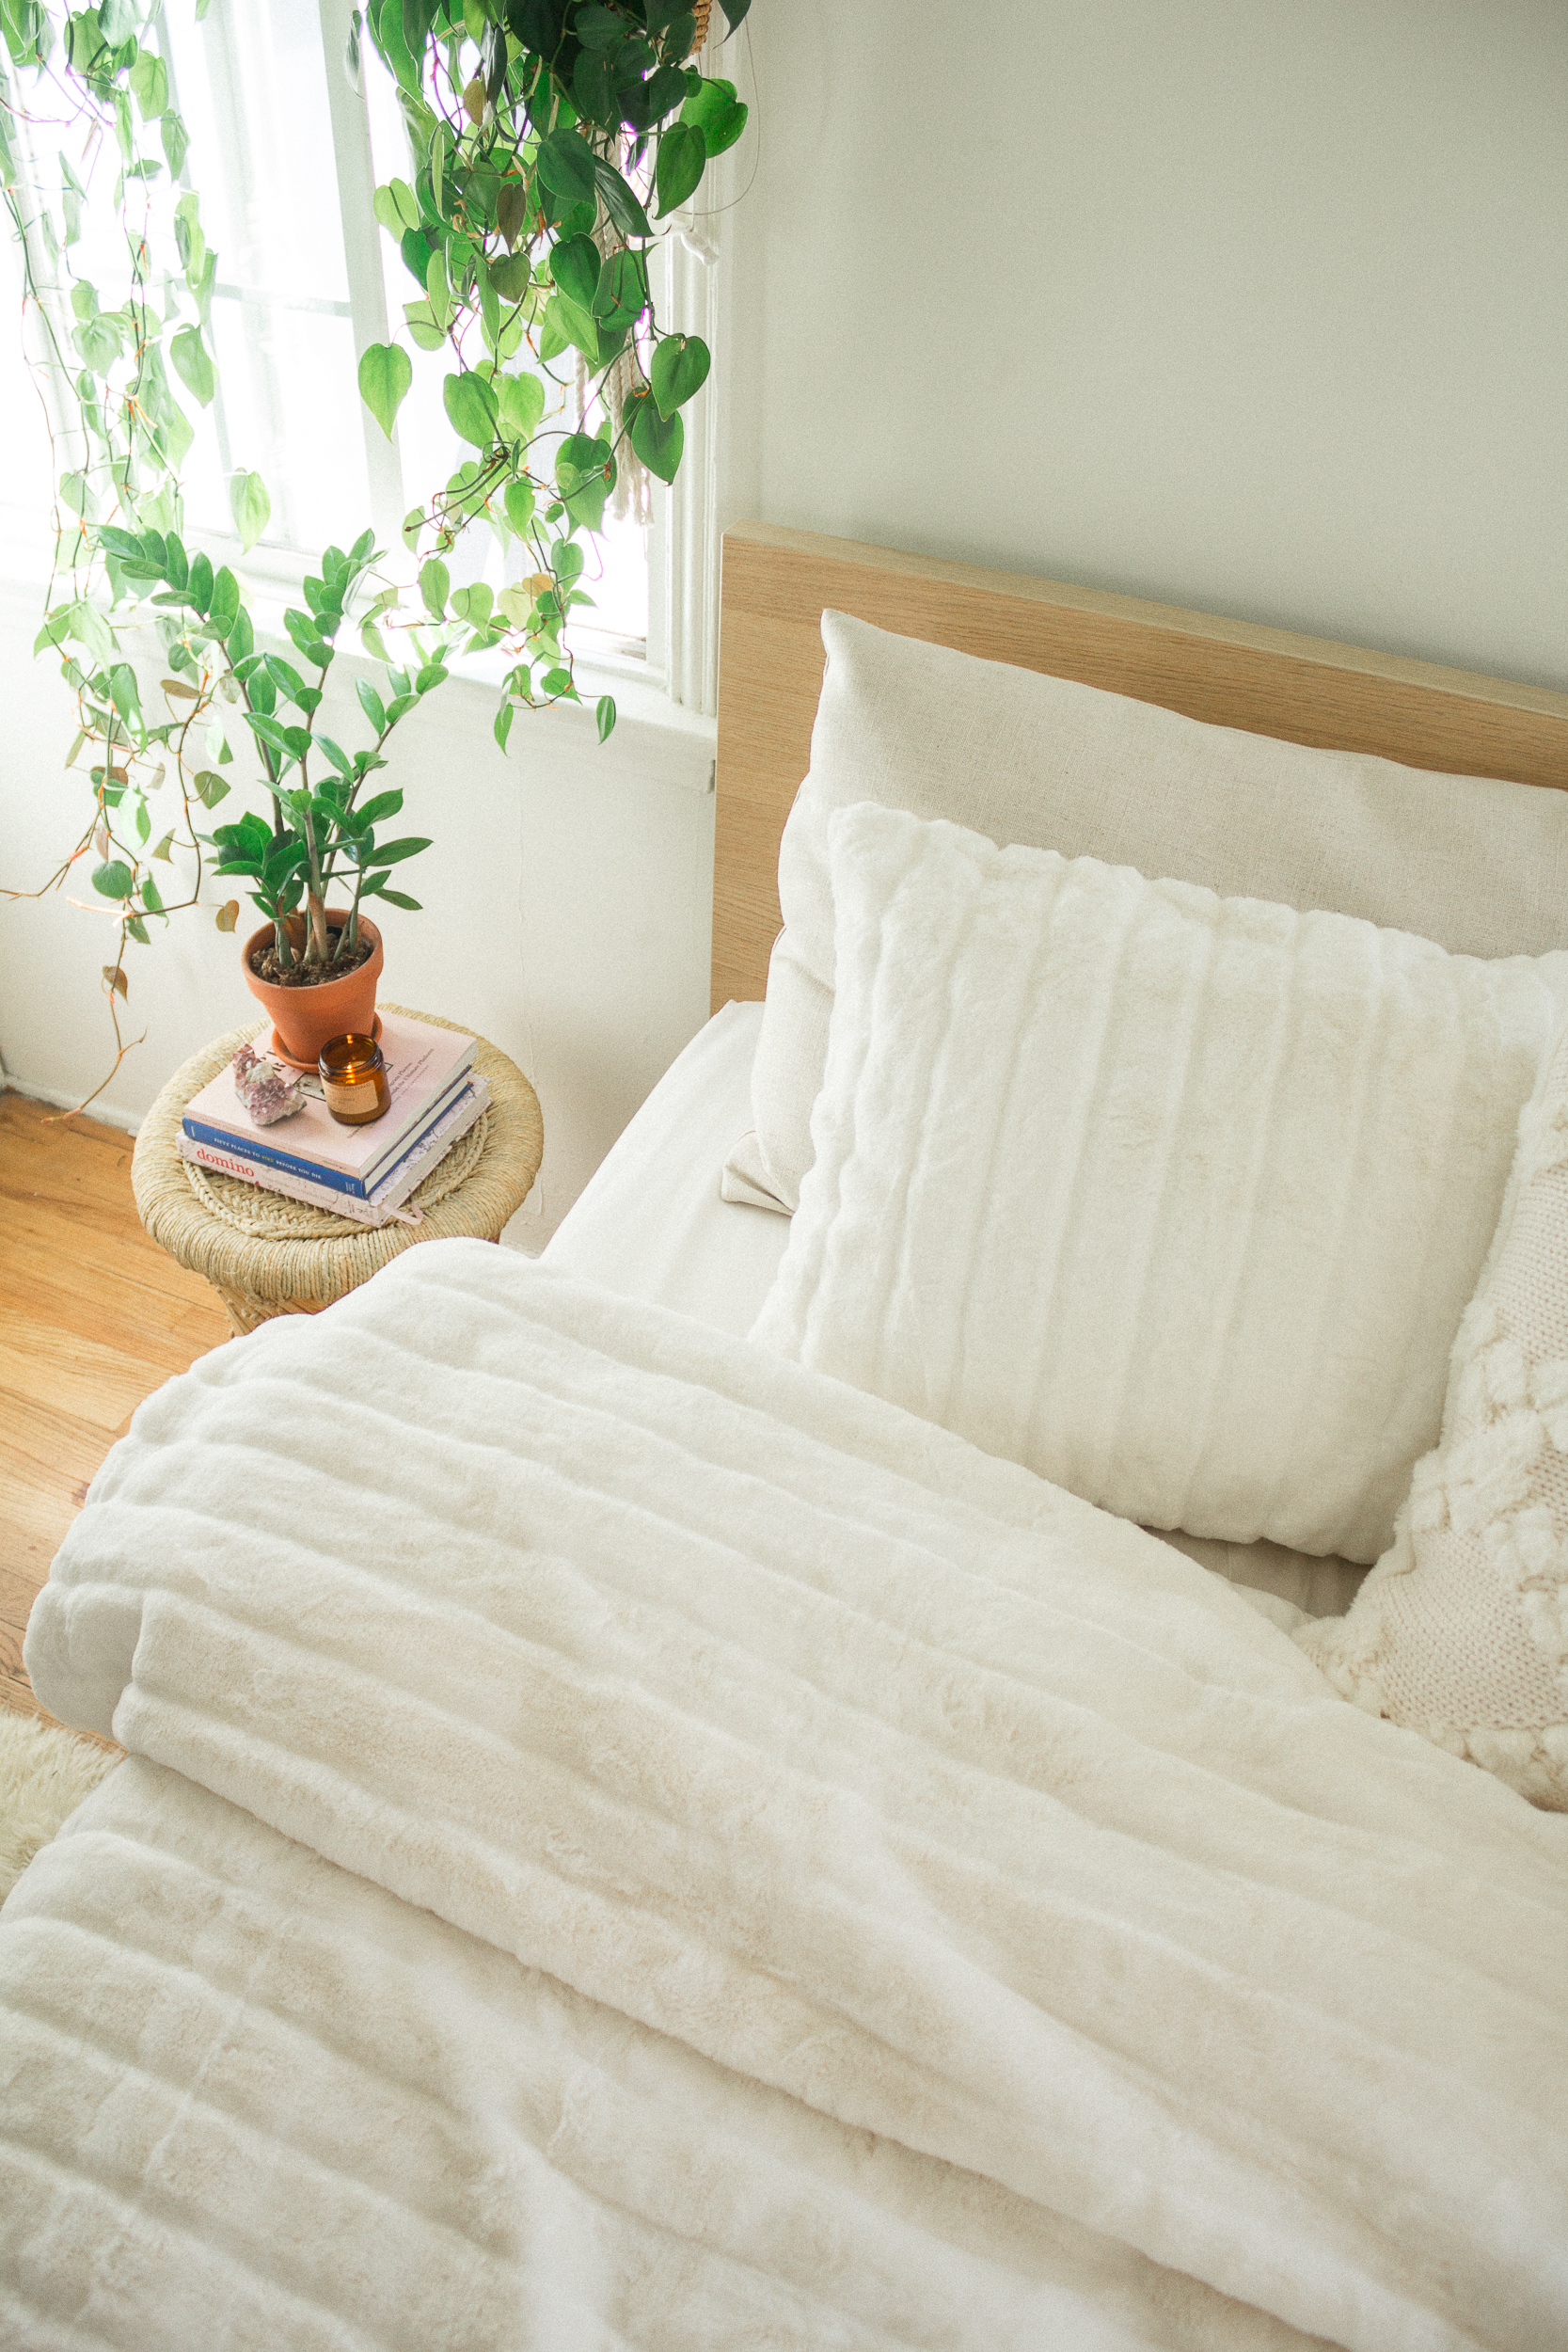 ugg bed bath beyond holiday decor 21